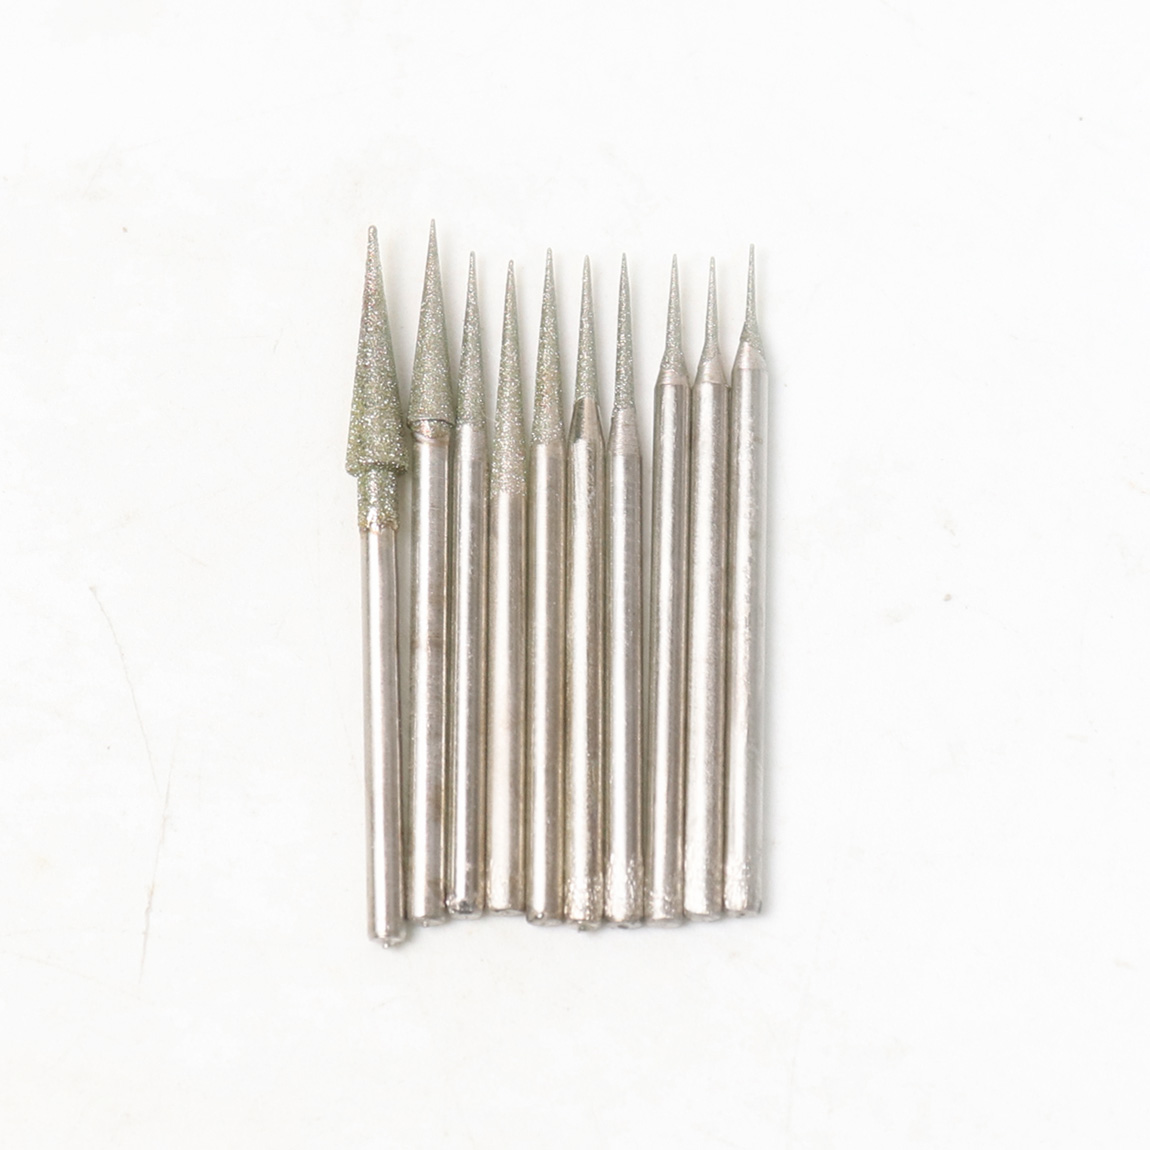 20Pcs Diamond Sharp Needle Burrs Rotary Point  Taper Grinding Head Shank 2.35mm